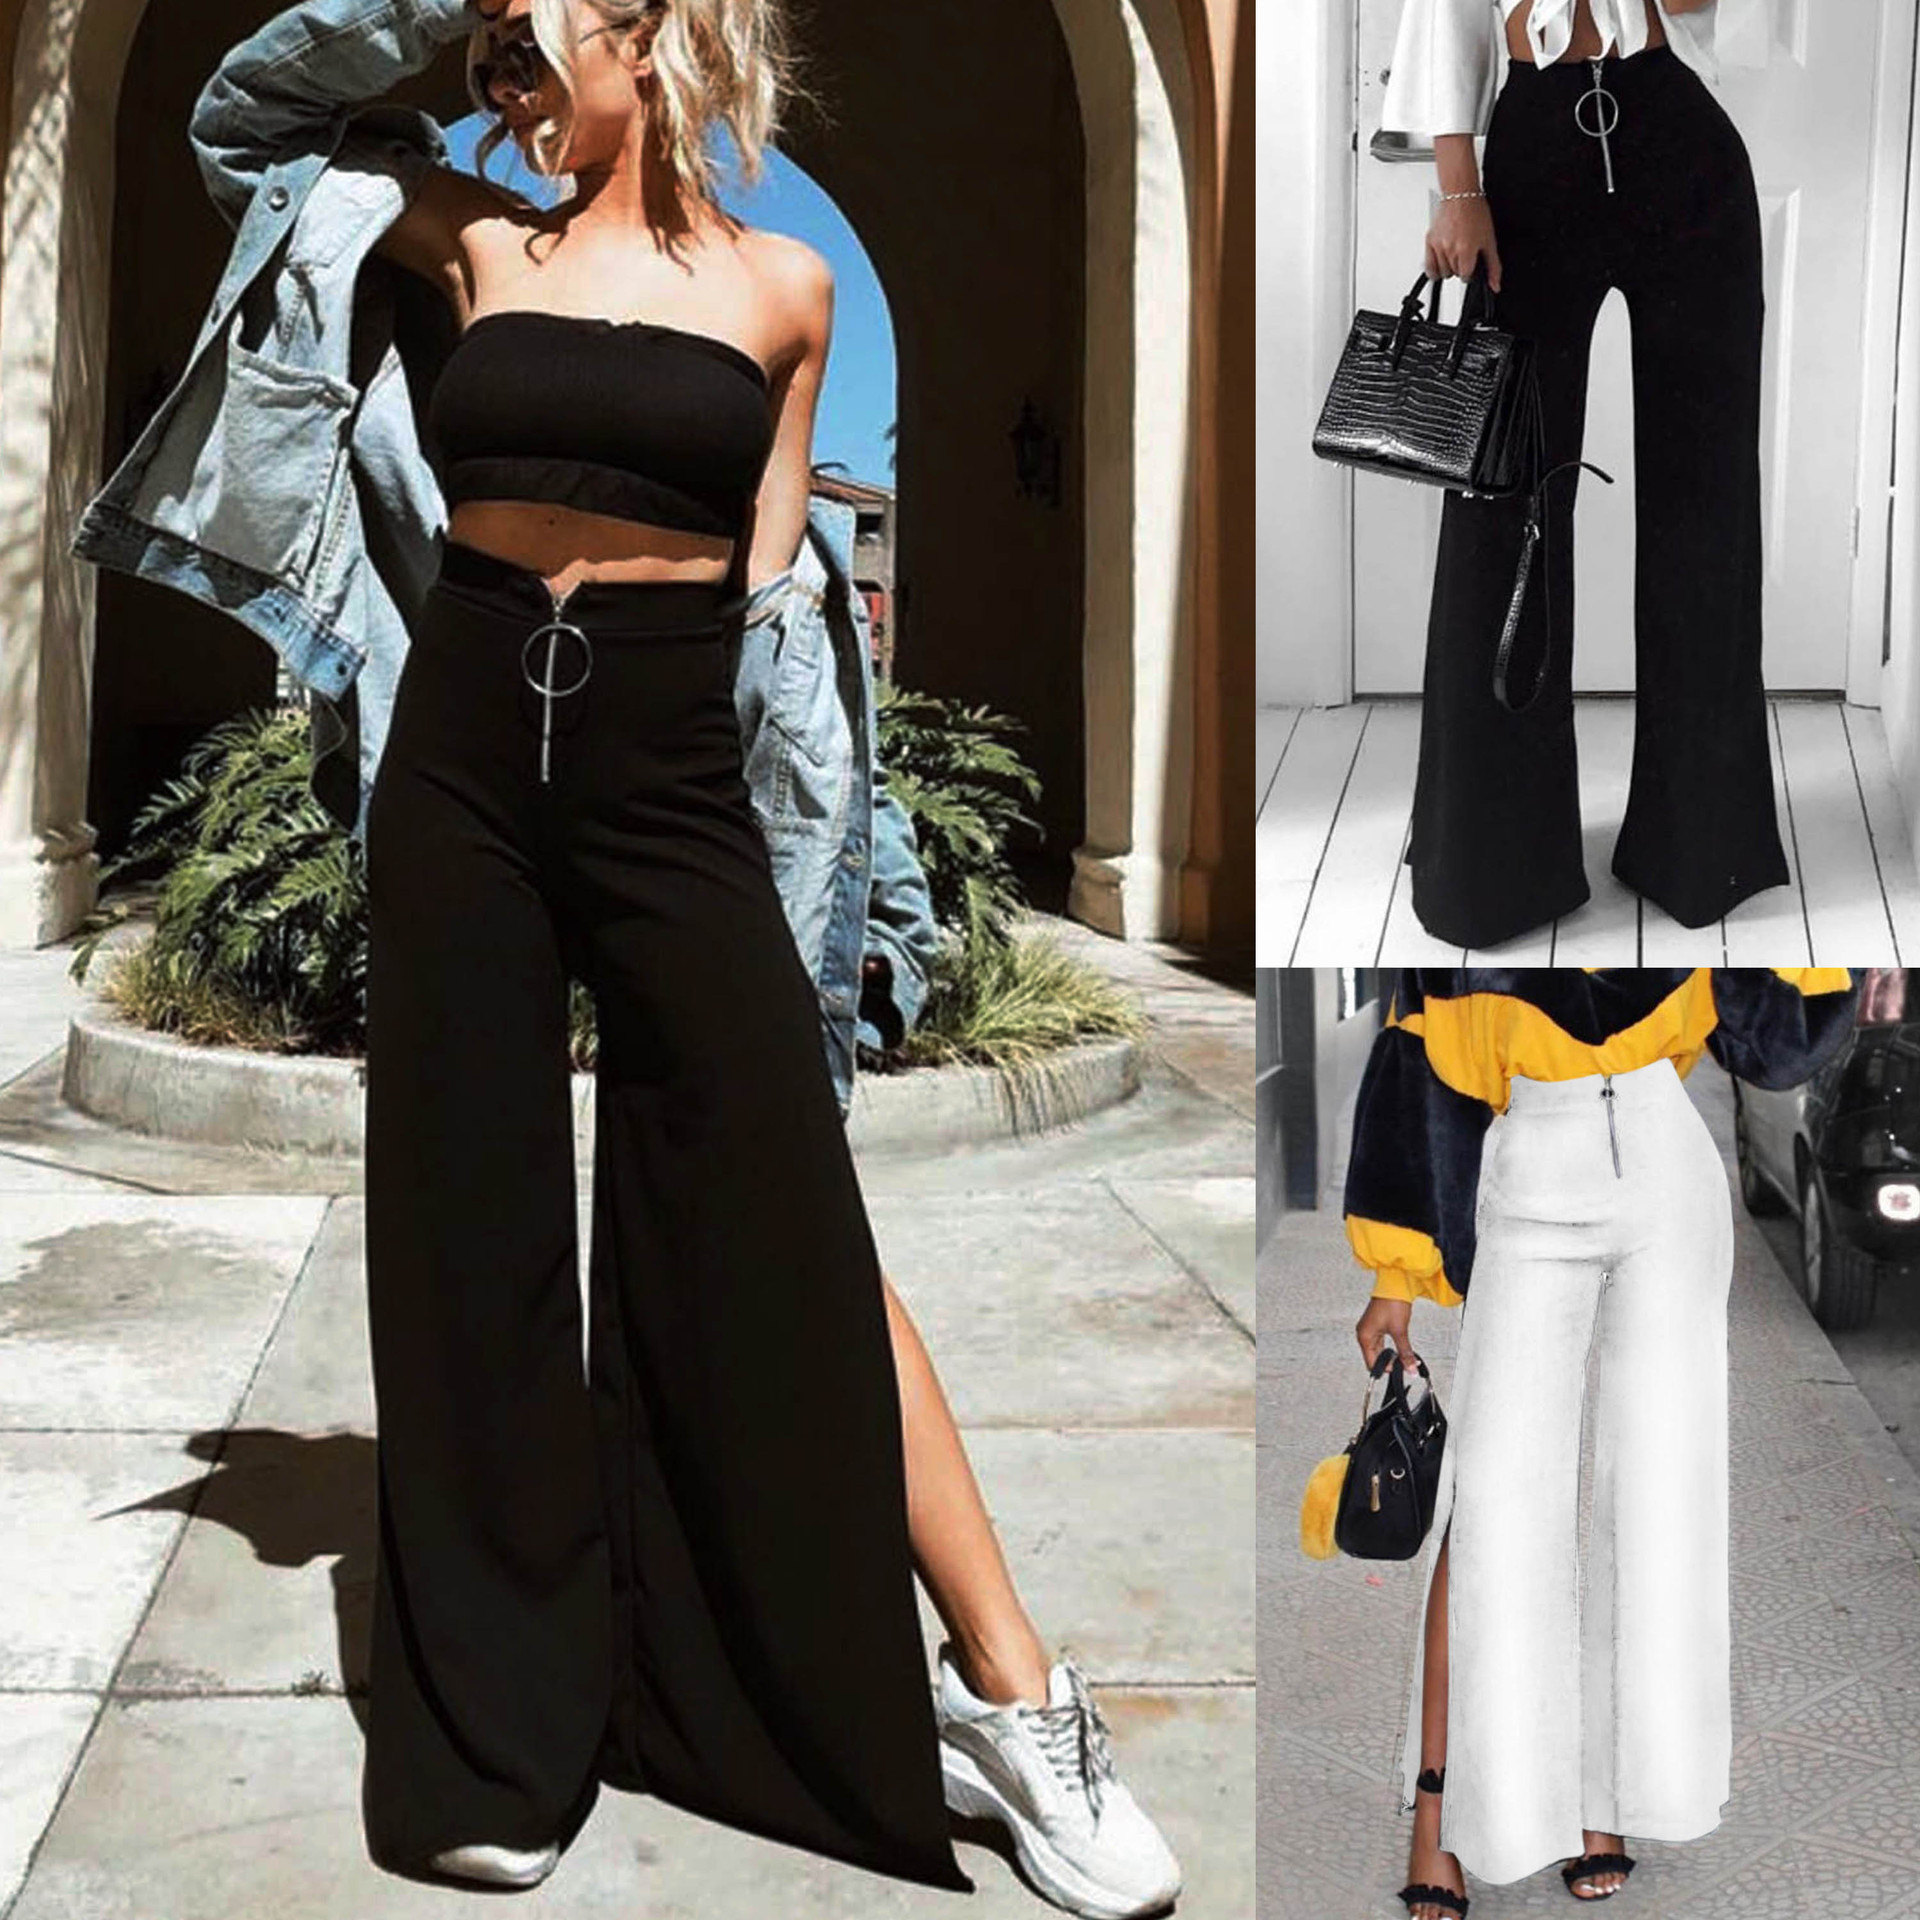 2018 Fashion Summer Loose   Wide     Leg     Pants   Black White Split   Pants   High Waist Summer   Pants   Trousers Women Sweatpants